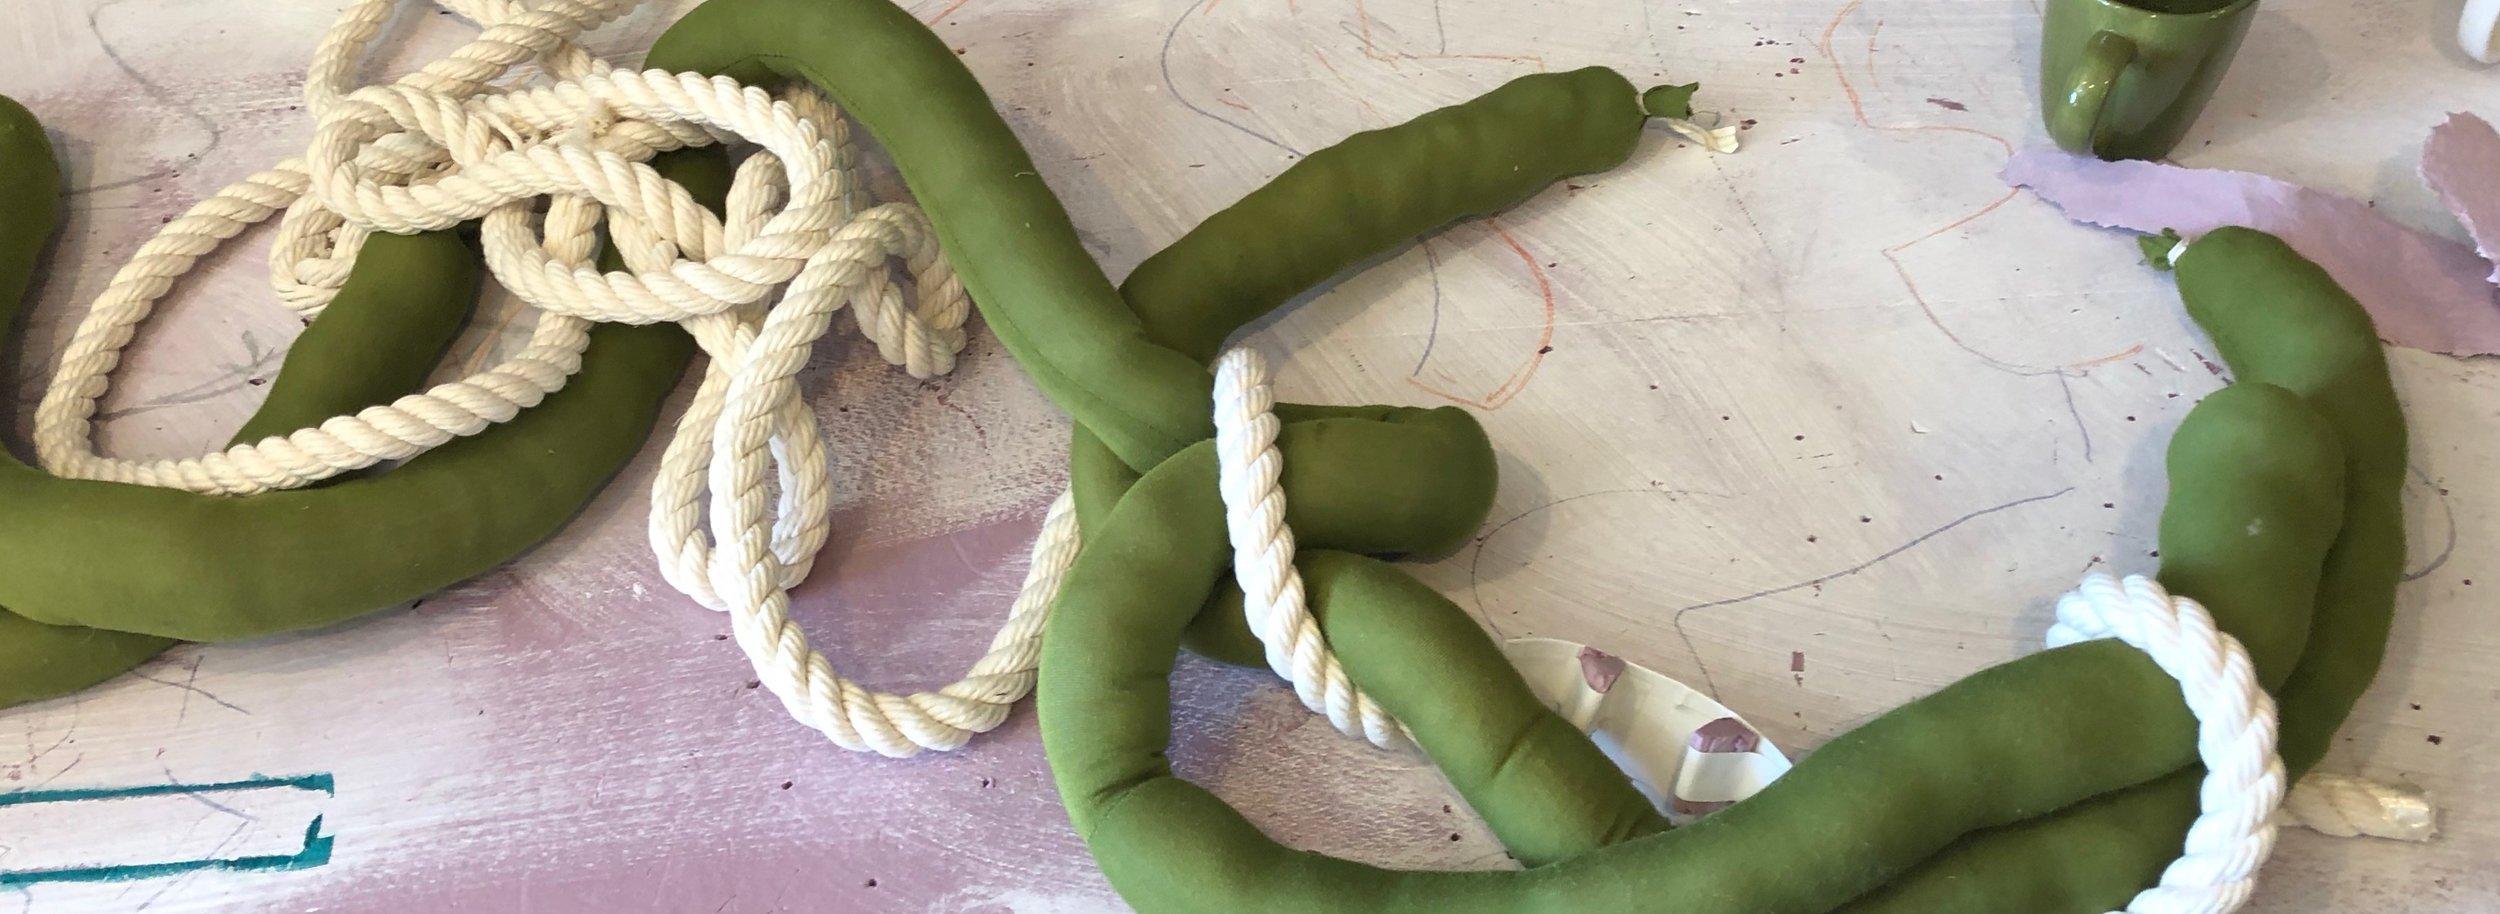 Landes-Sullivan-abaca-coils-sealant-core-like-rope.jpg